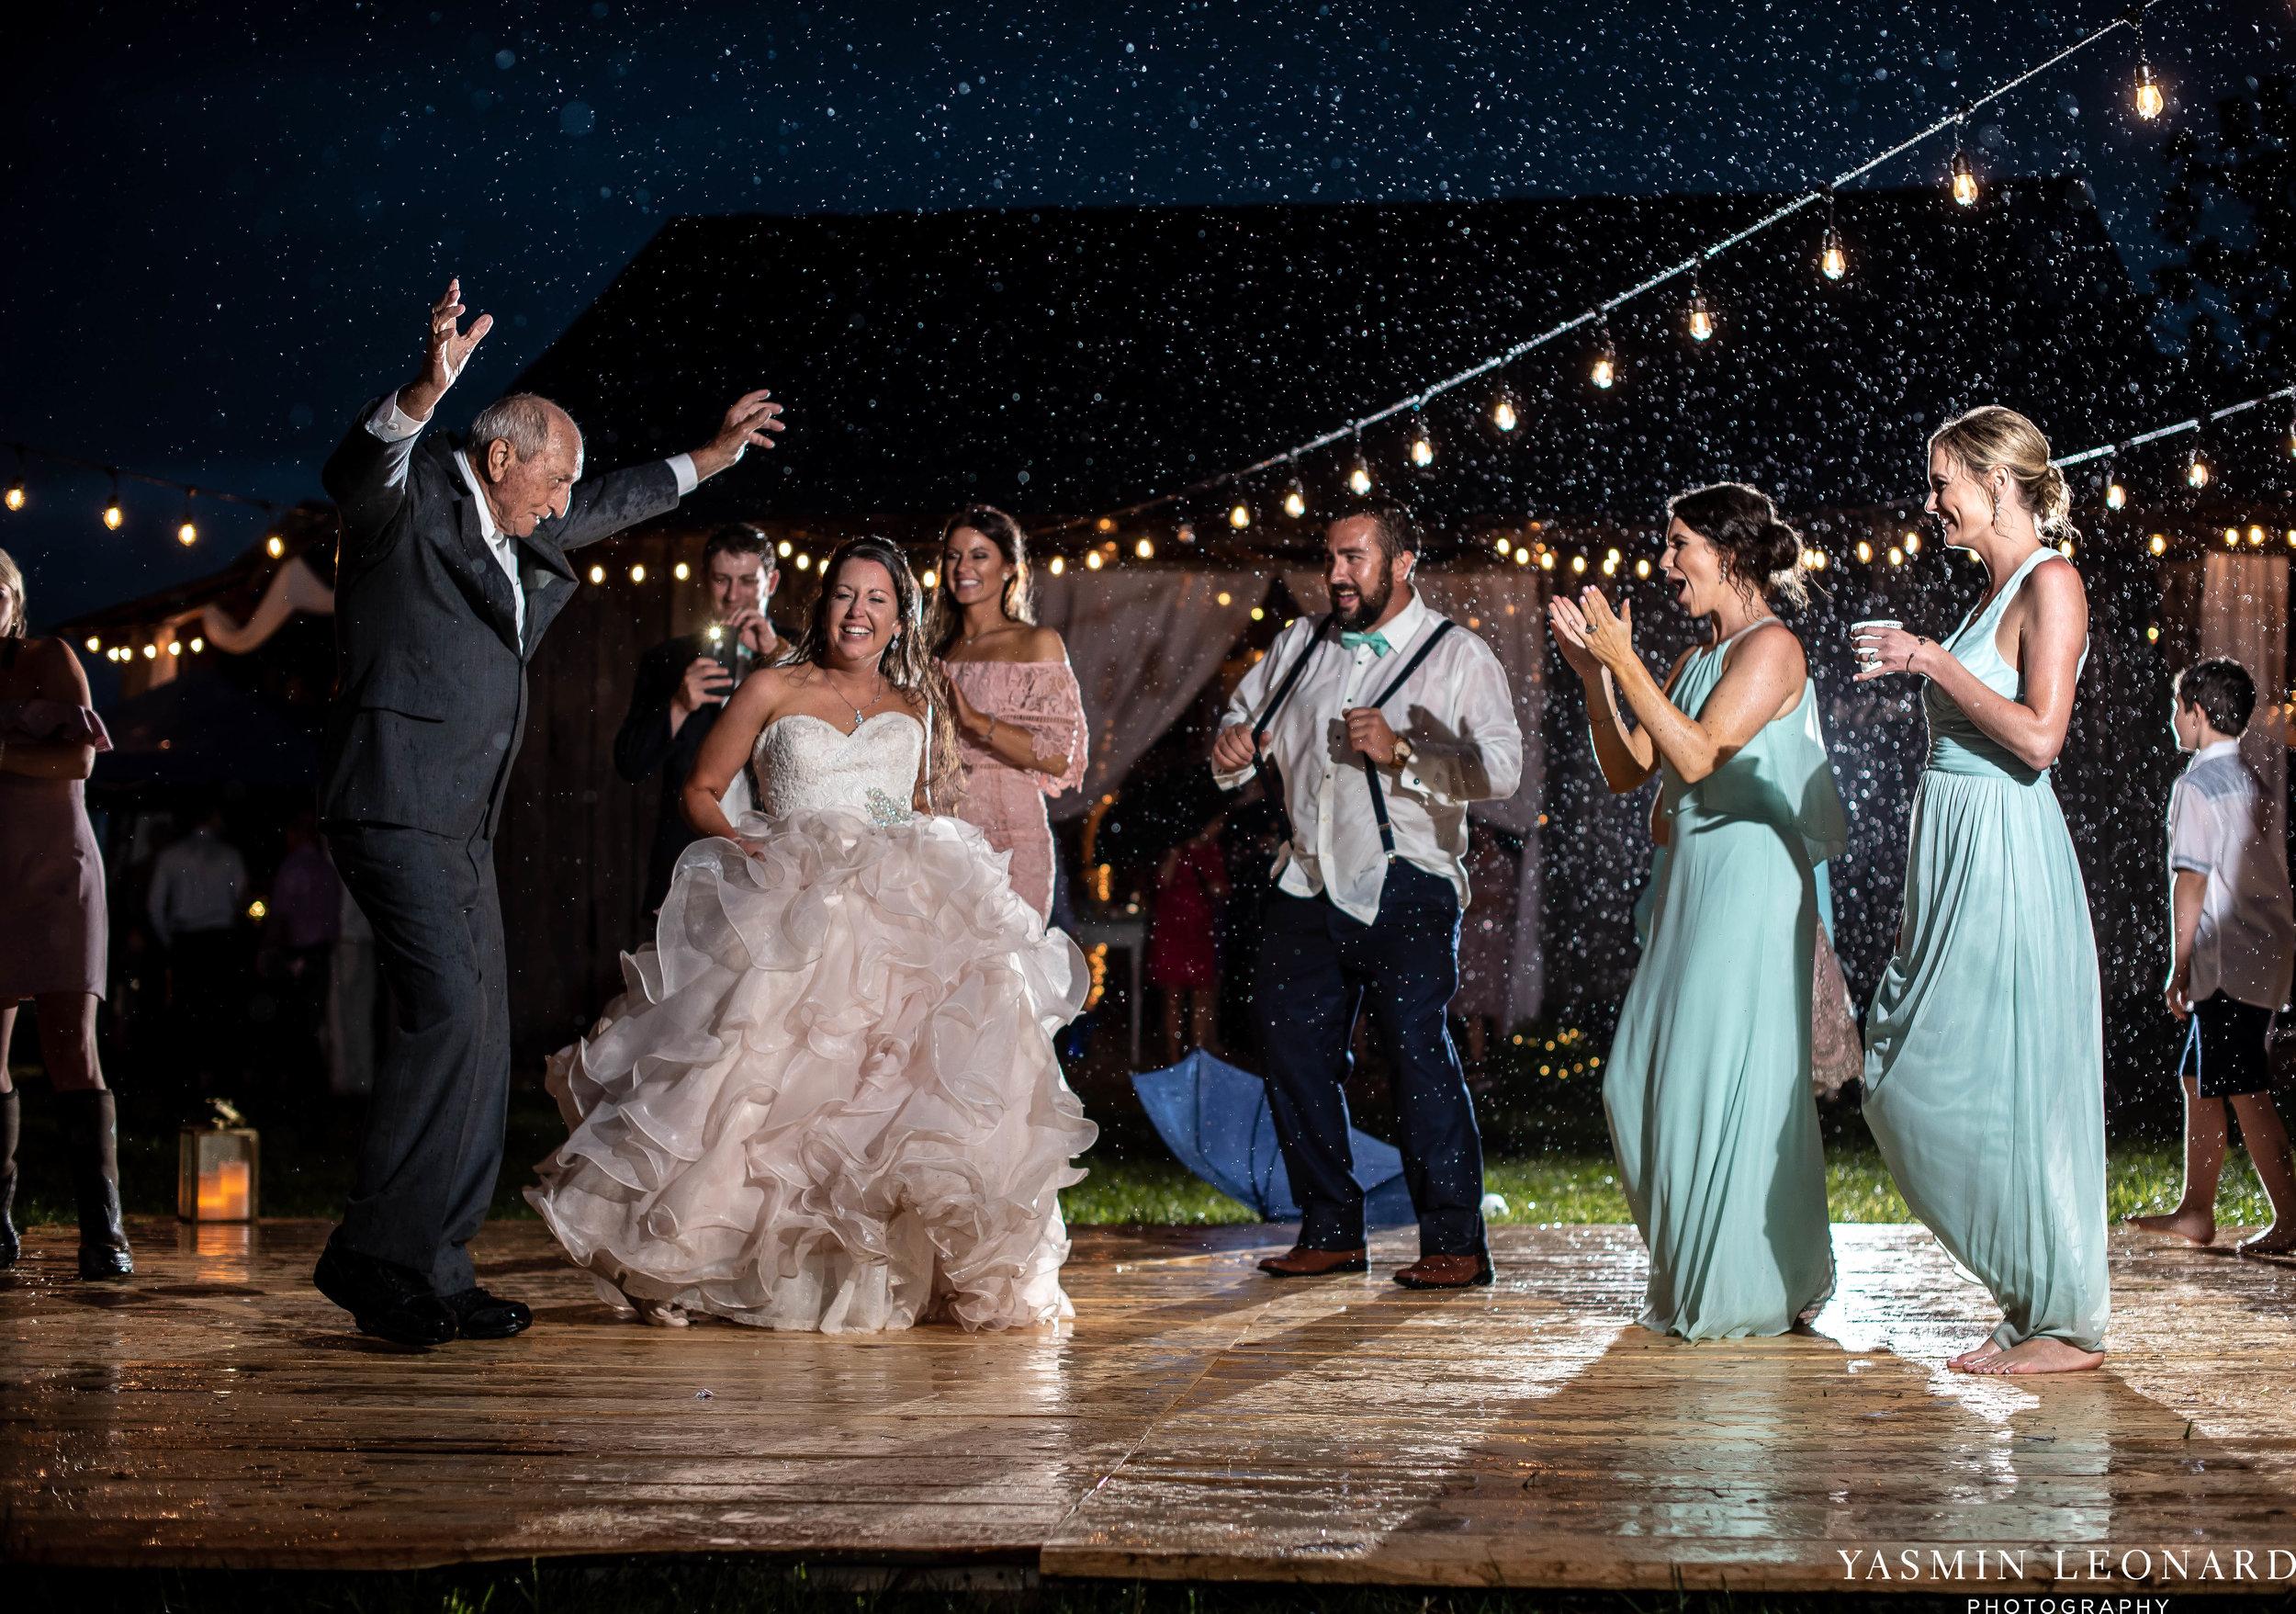 Rain on your wedding day - Rainy Wedding - Plan B for Rain - What to do if it rains on your wedding day - Wedding Inspiration - Outdoor wedding ideas - Rainy Wedding Pictures - Yasmin Leonard Photography-87.jpg